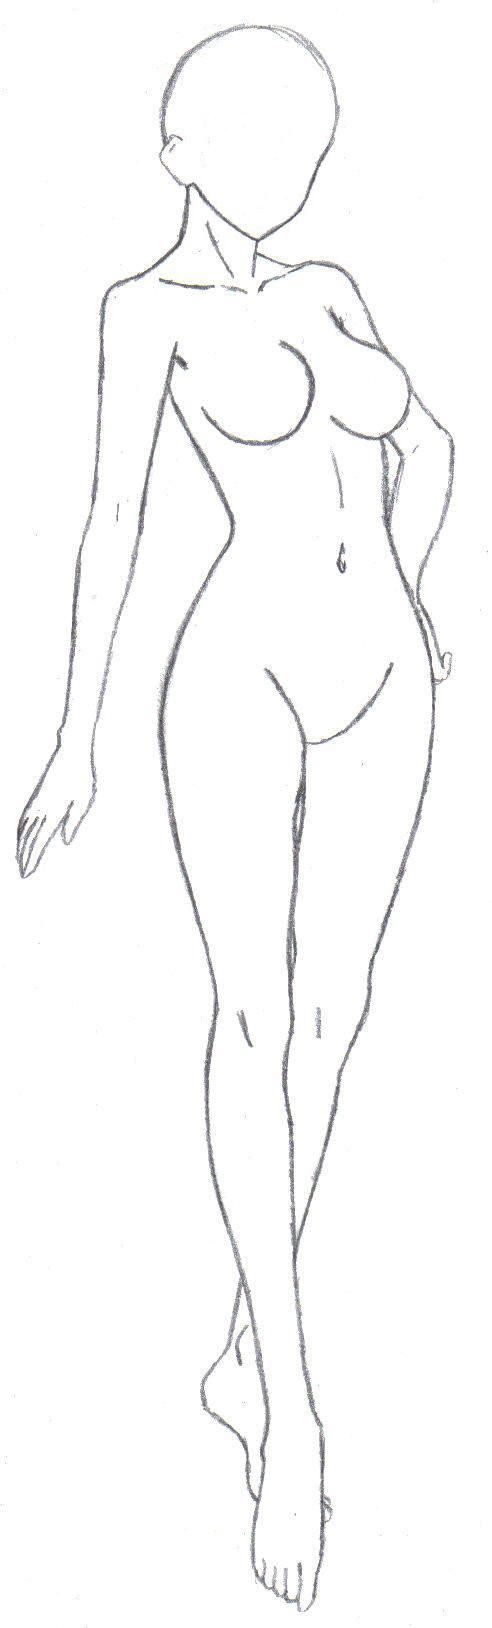 body frame 2 by beta type jakuri deviantart com on deviantart